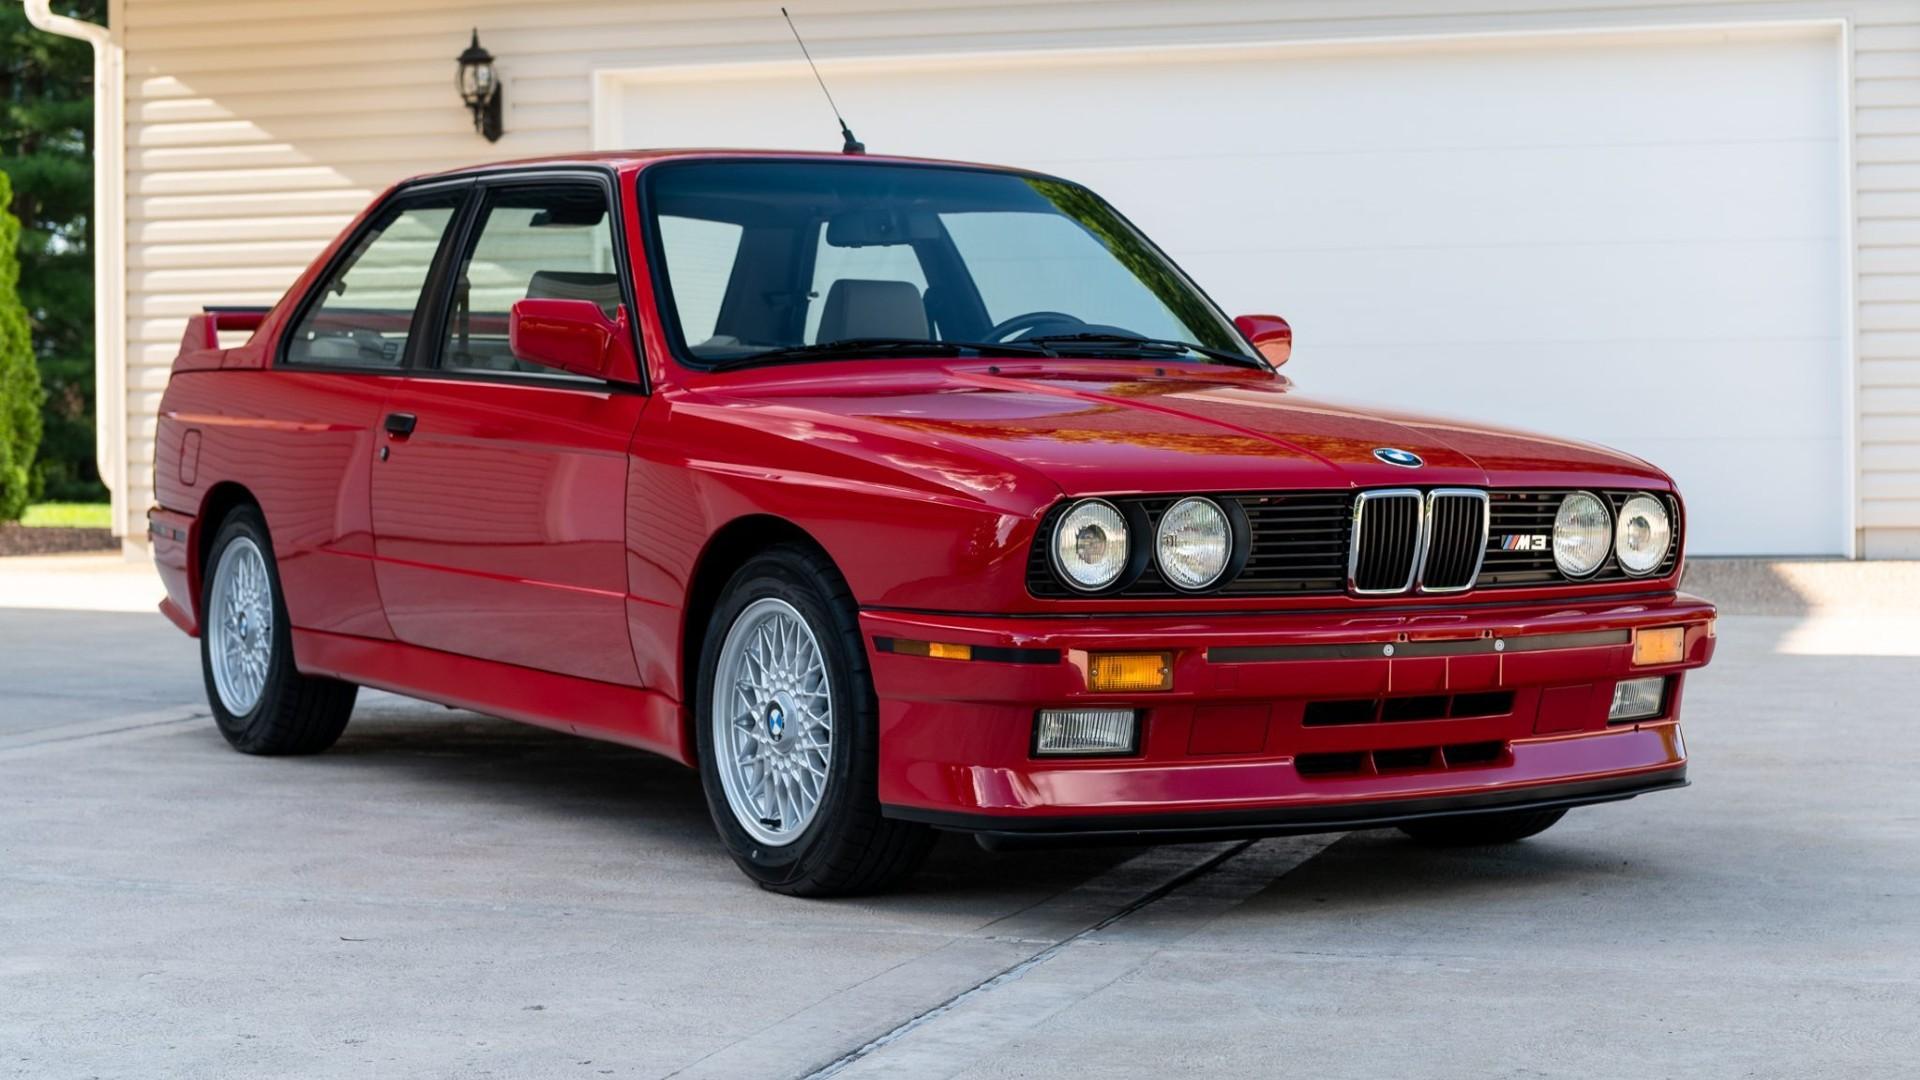 BMW M3 E30 πουλήθηκε σε τιμή… σούπερκαρ! [vid]